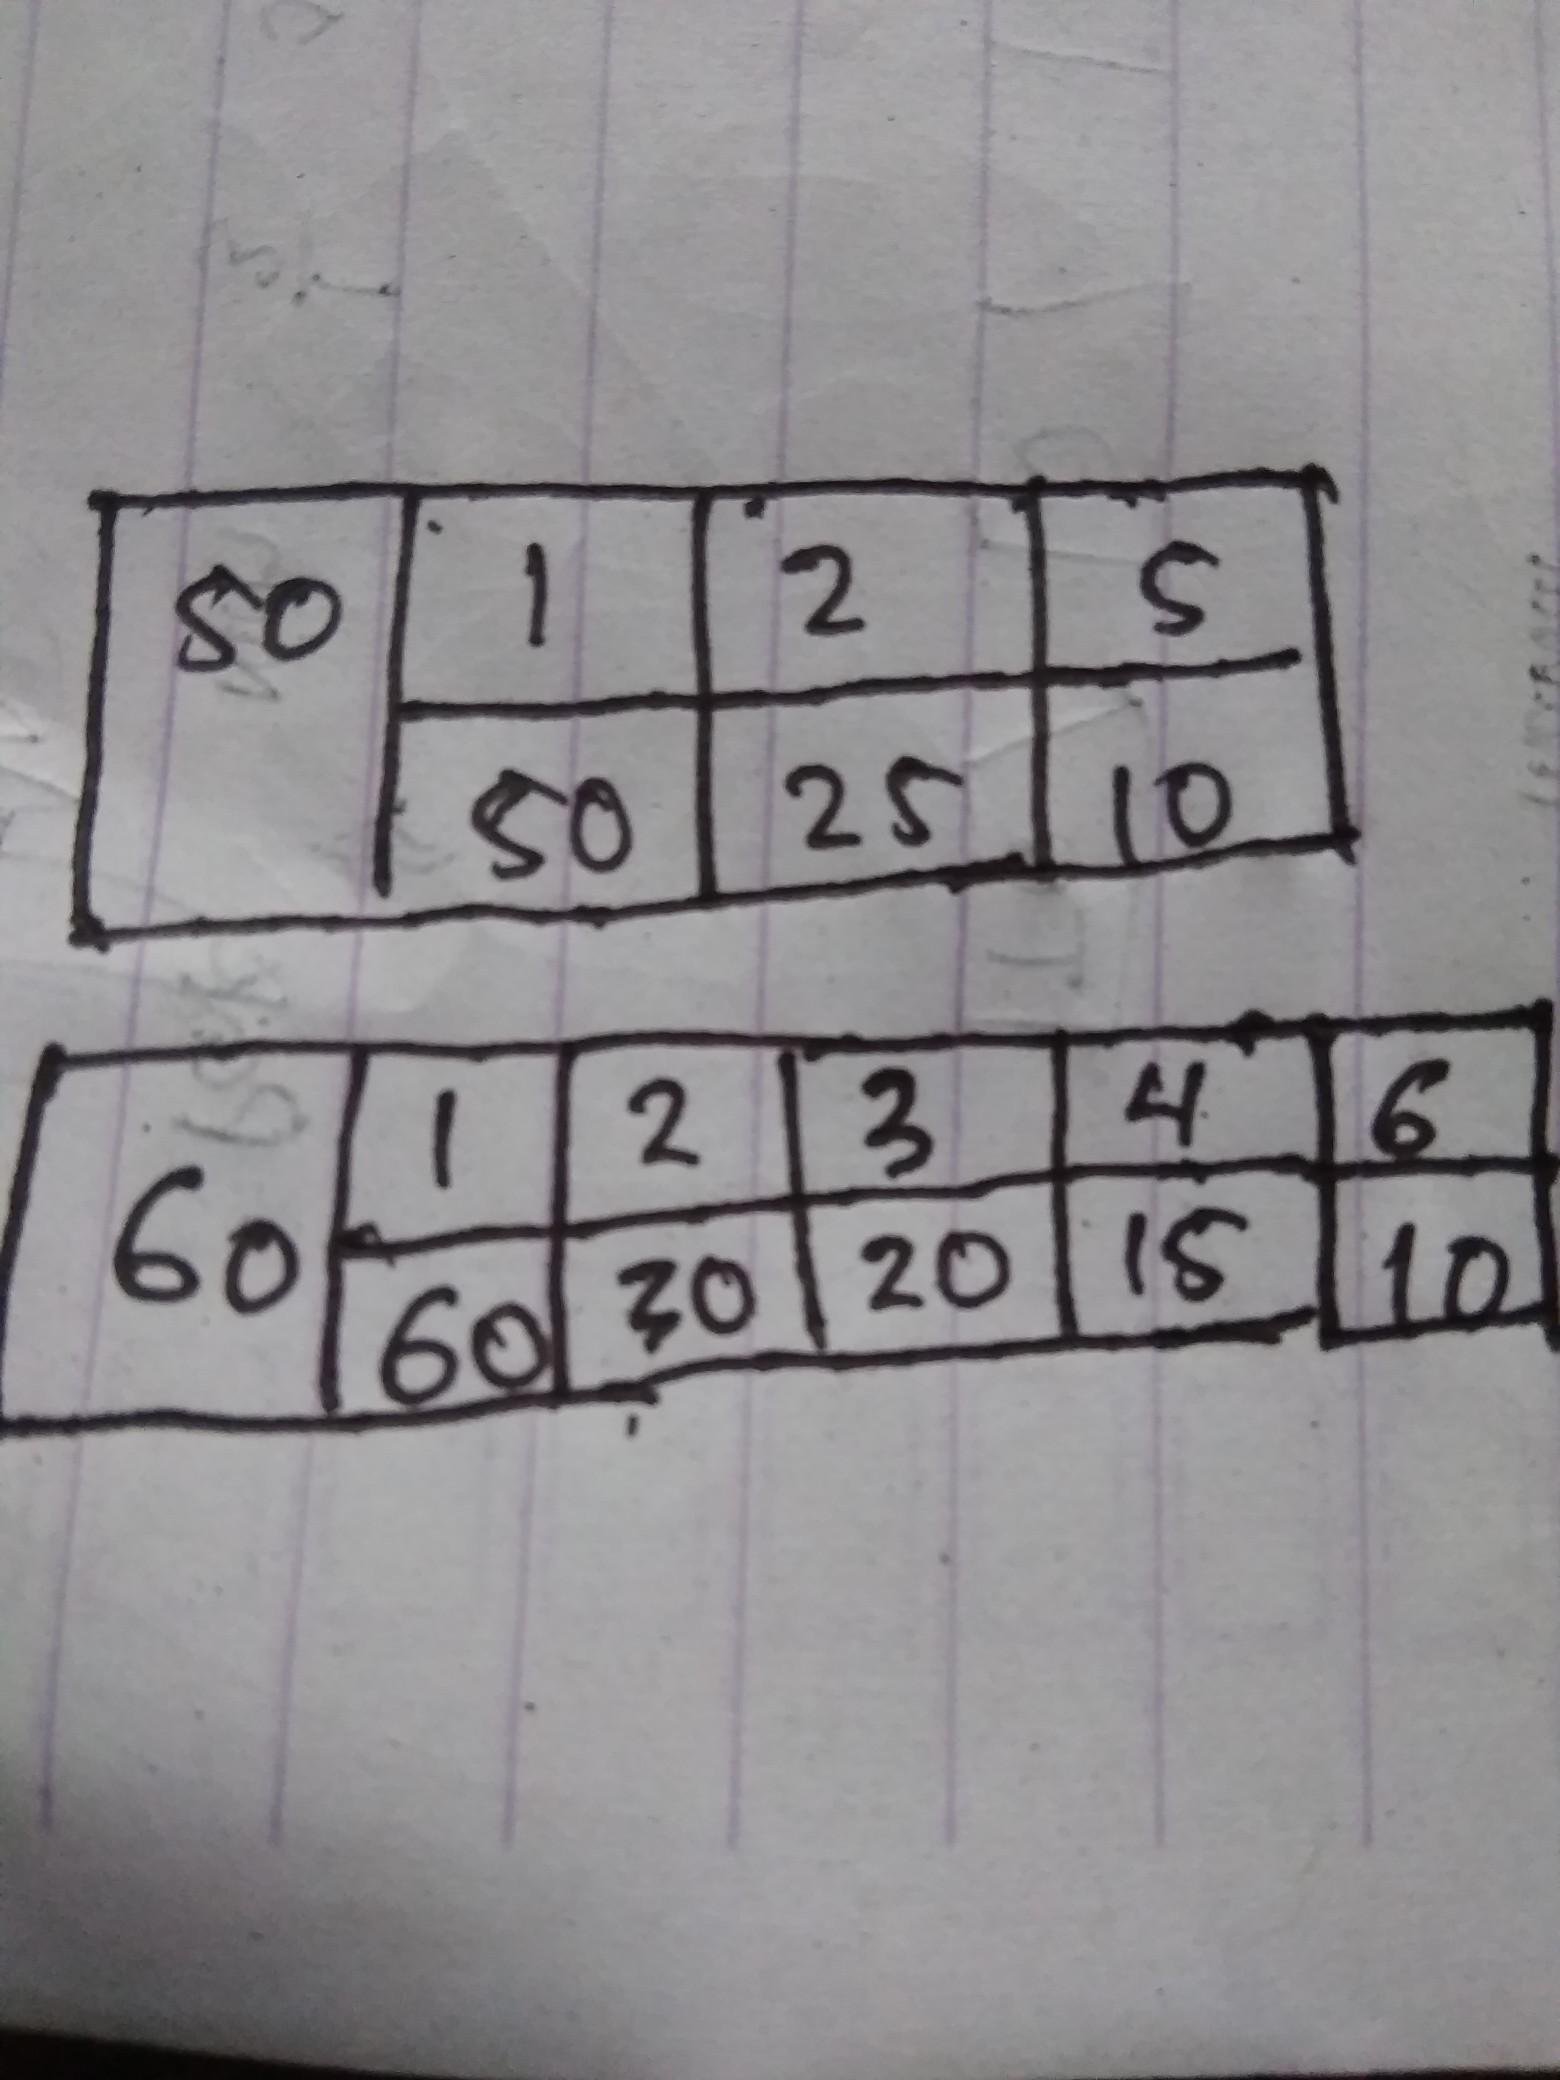 Faktorisasi Prima Dari 60 : faktorisasi, prima, Faktorisasi, Prima, Dengan, Tabel, Brainly.co.id